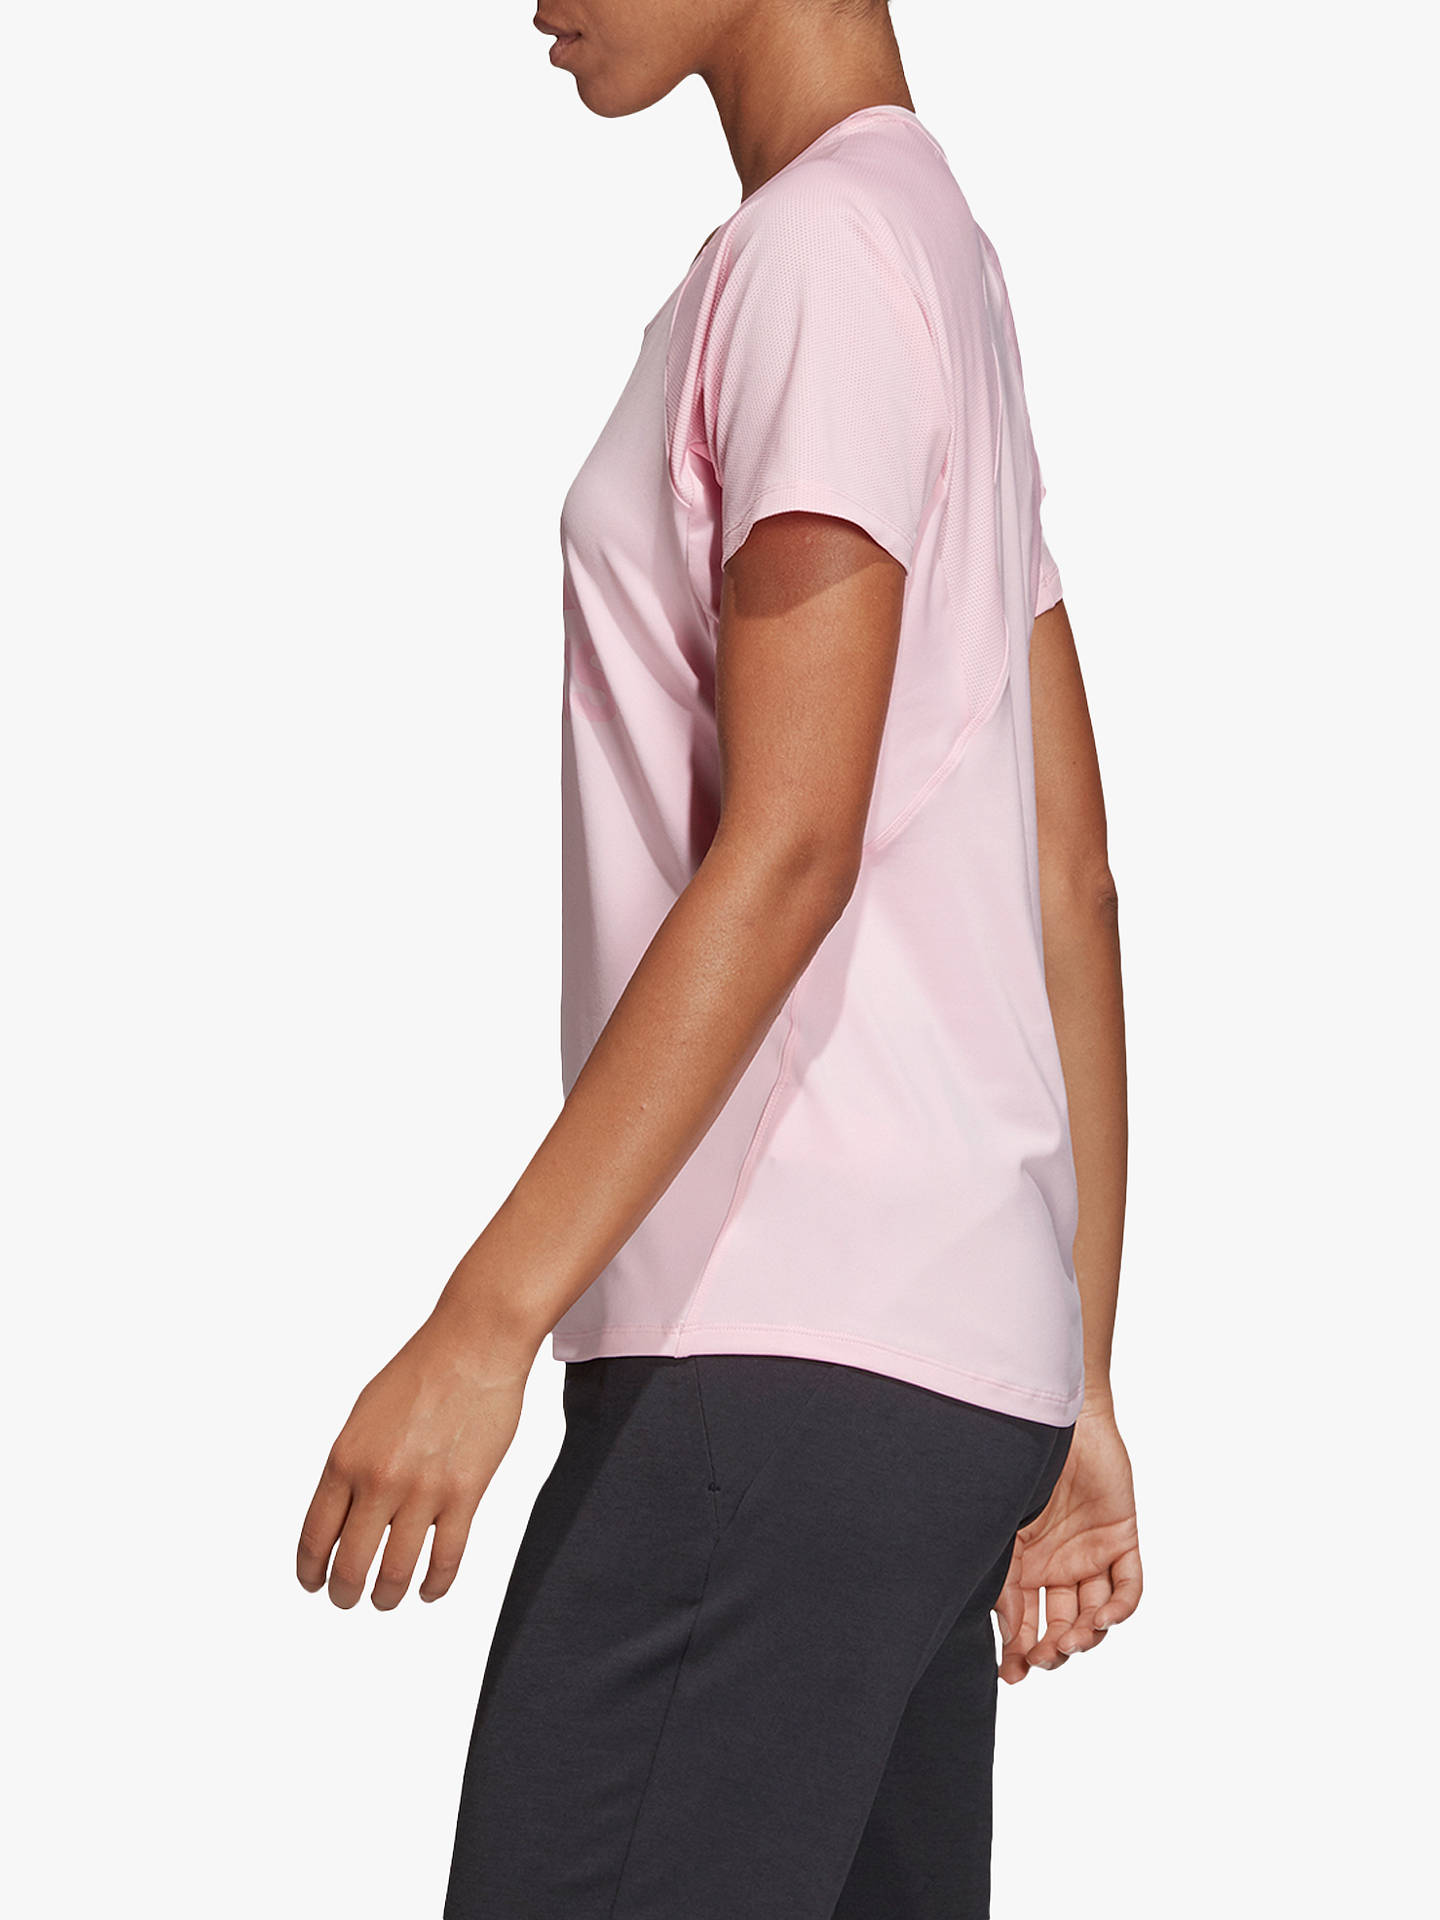 reputable site 1ab8d 7f9fb Buy adidas Training Logo T-Shirt, True Pink, L Online at johnlewis.